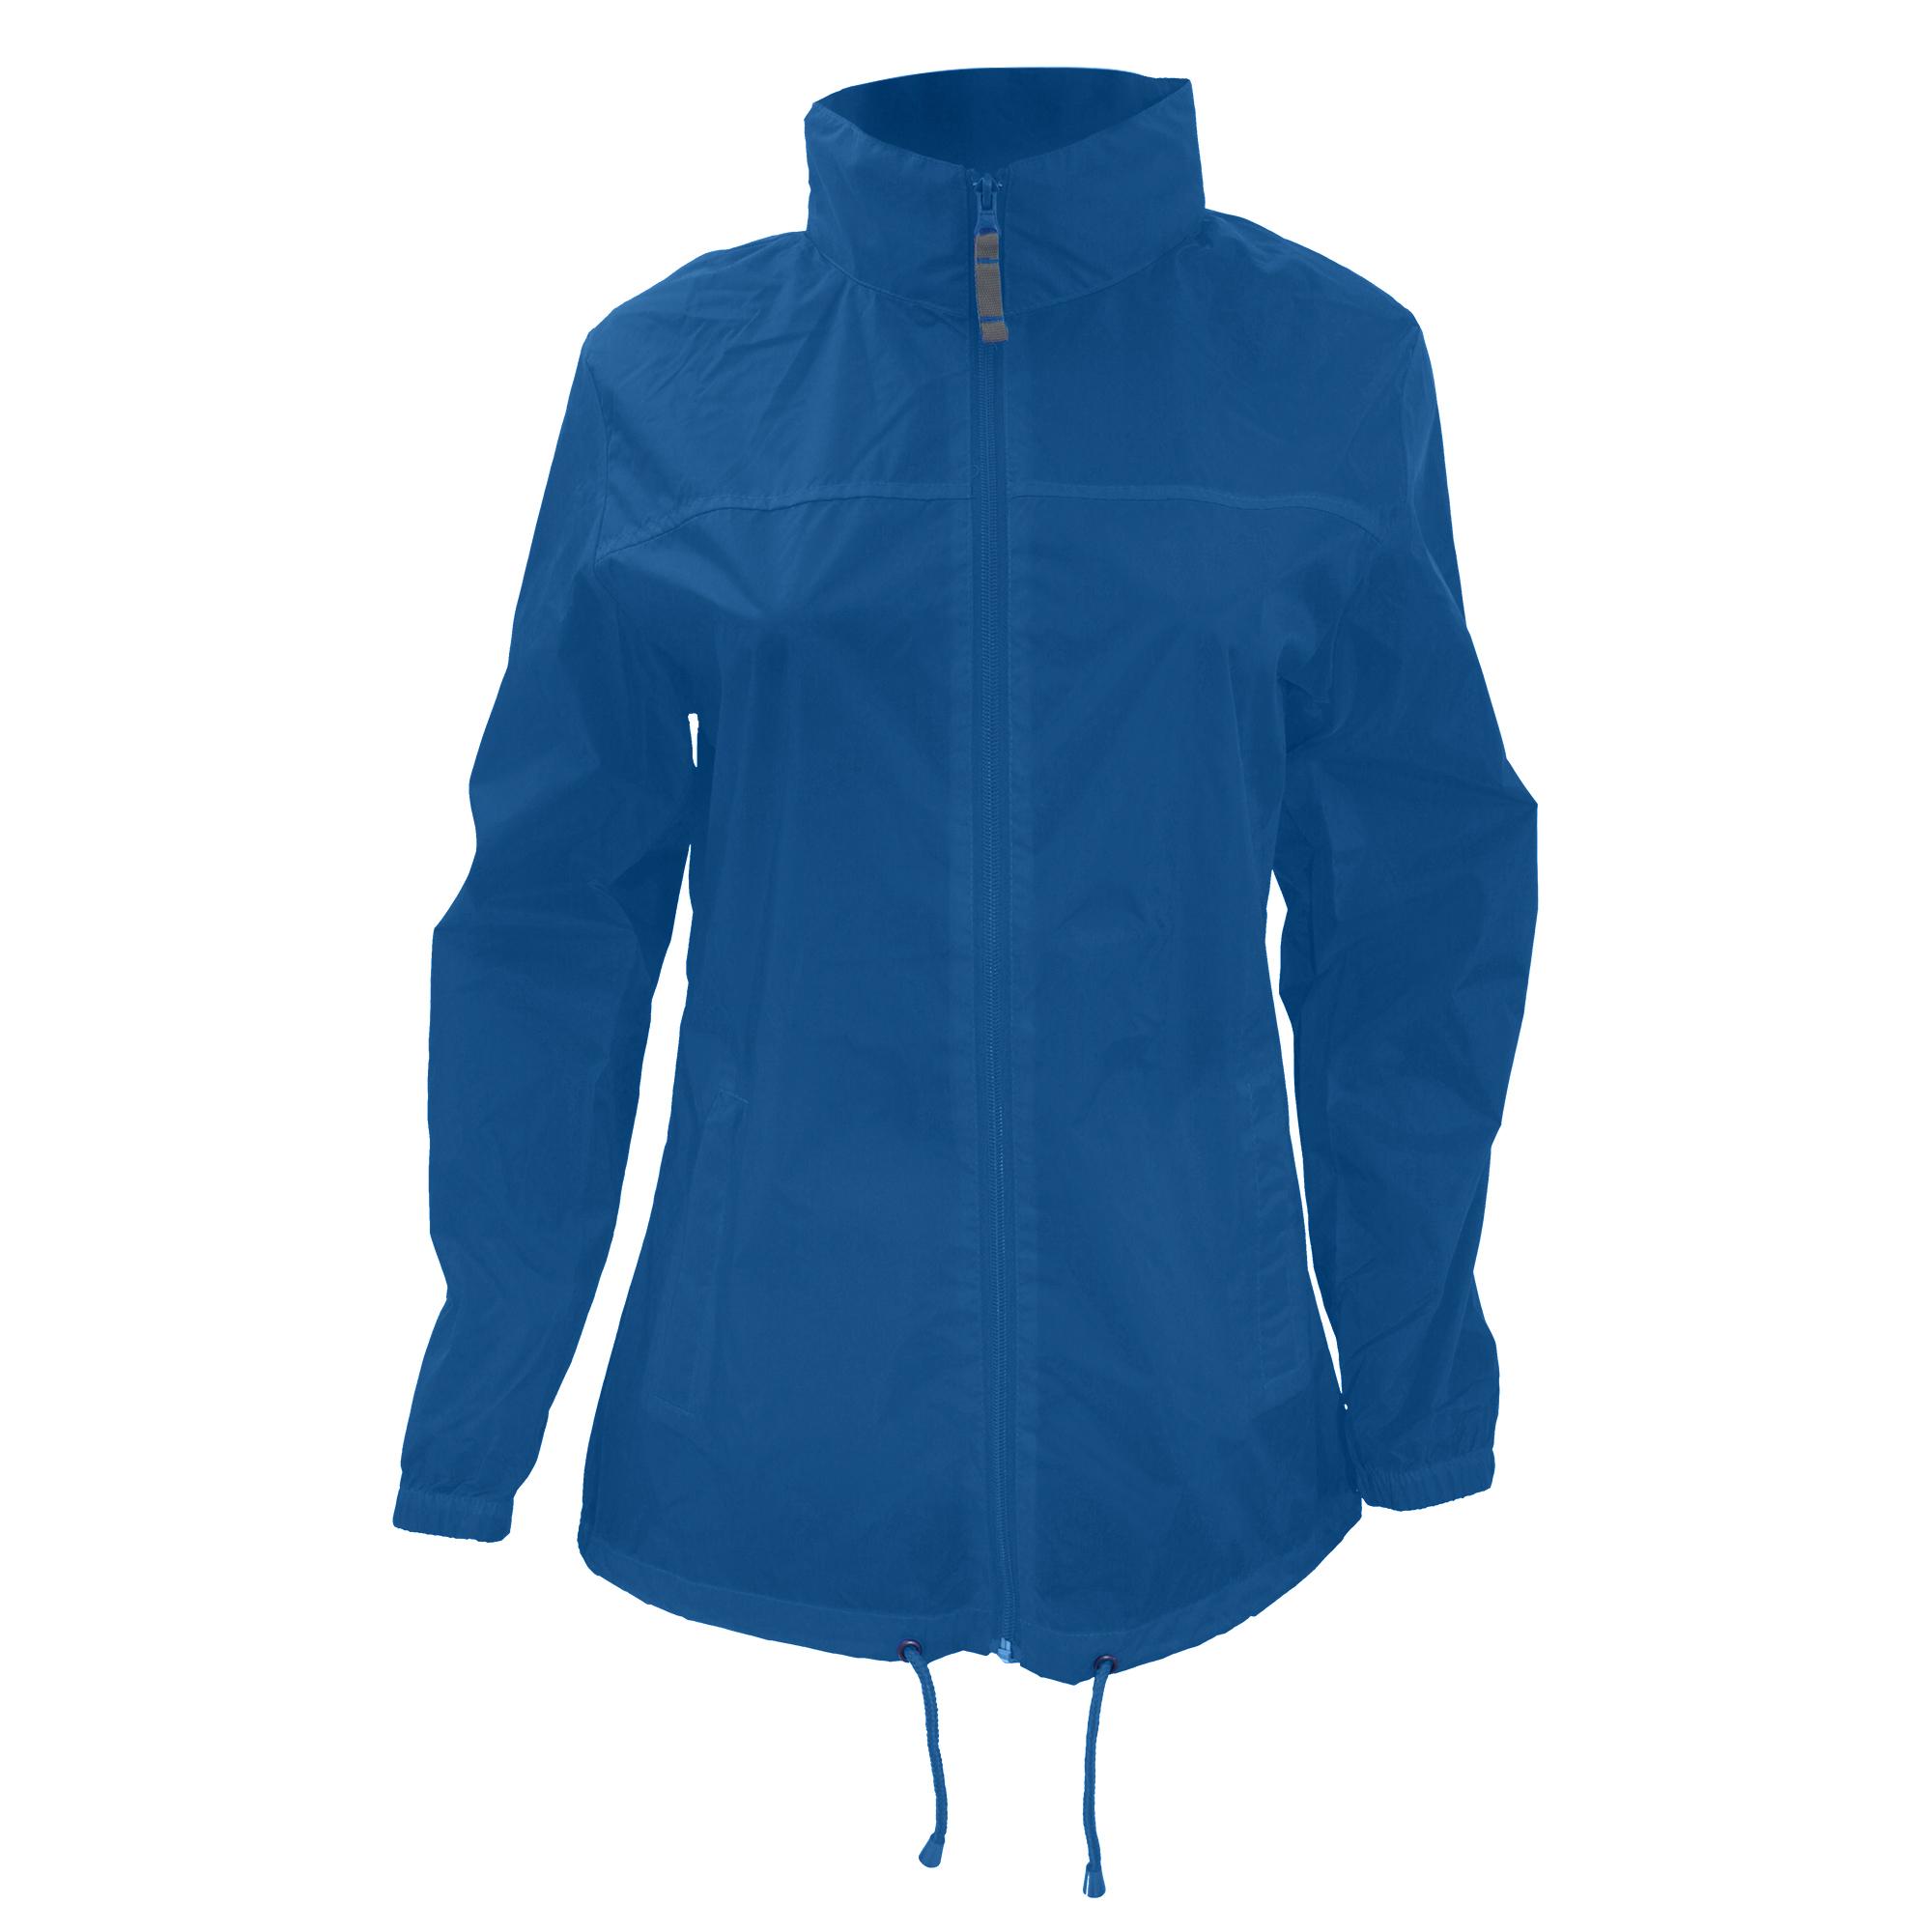 B&C Womens/Ladies Sirocco Lightweight Windproof, Showerproof & Water Repellent Jacket (S) (Royal Blue)